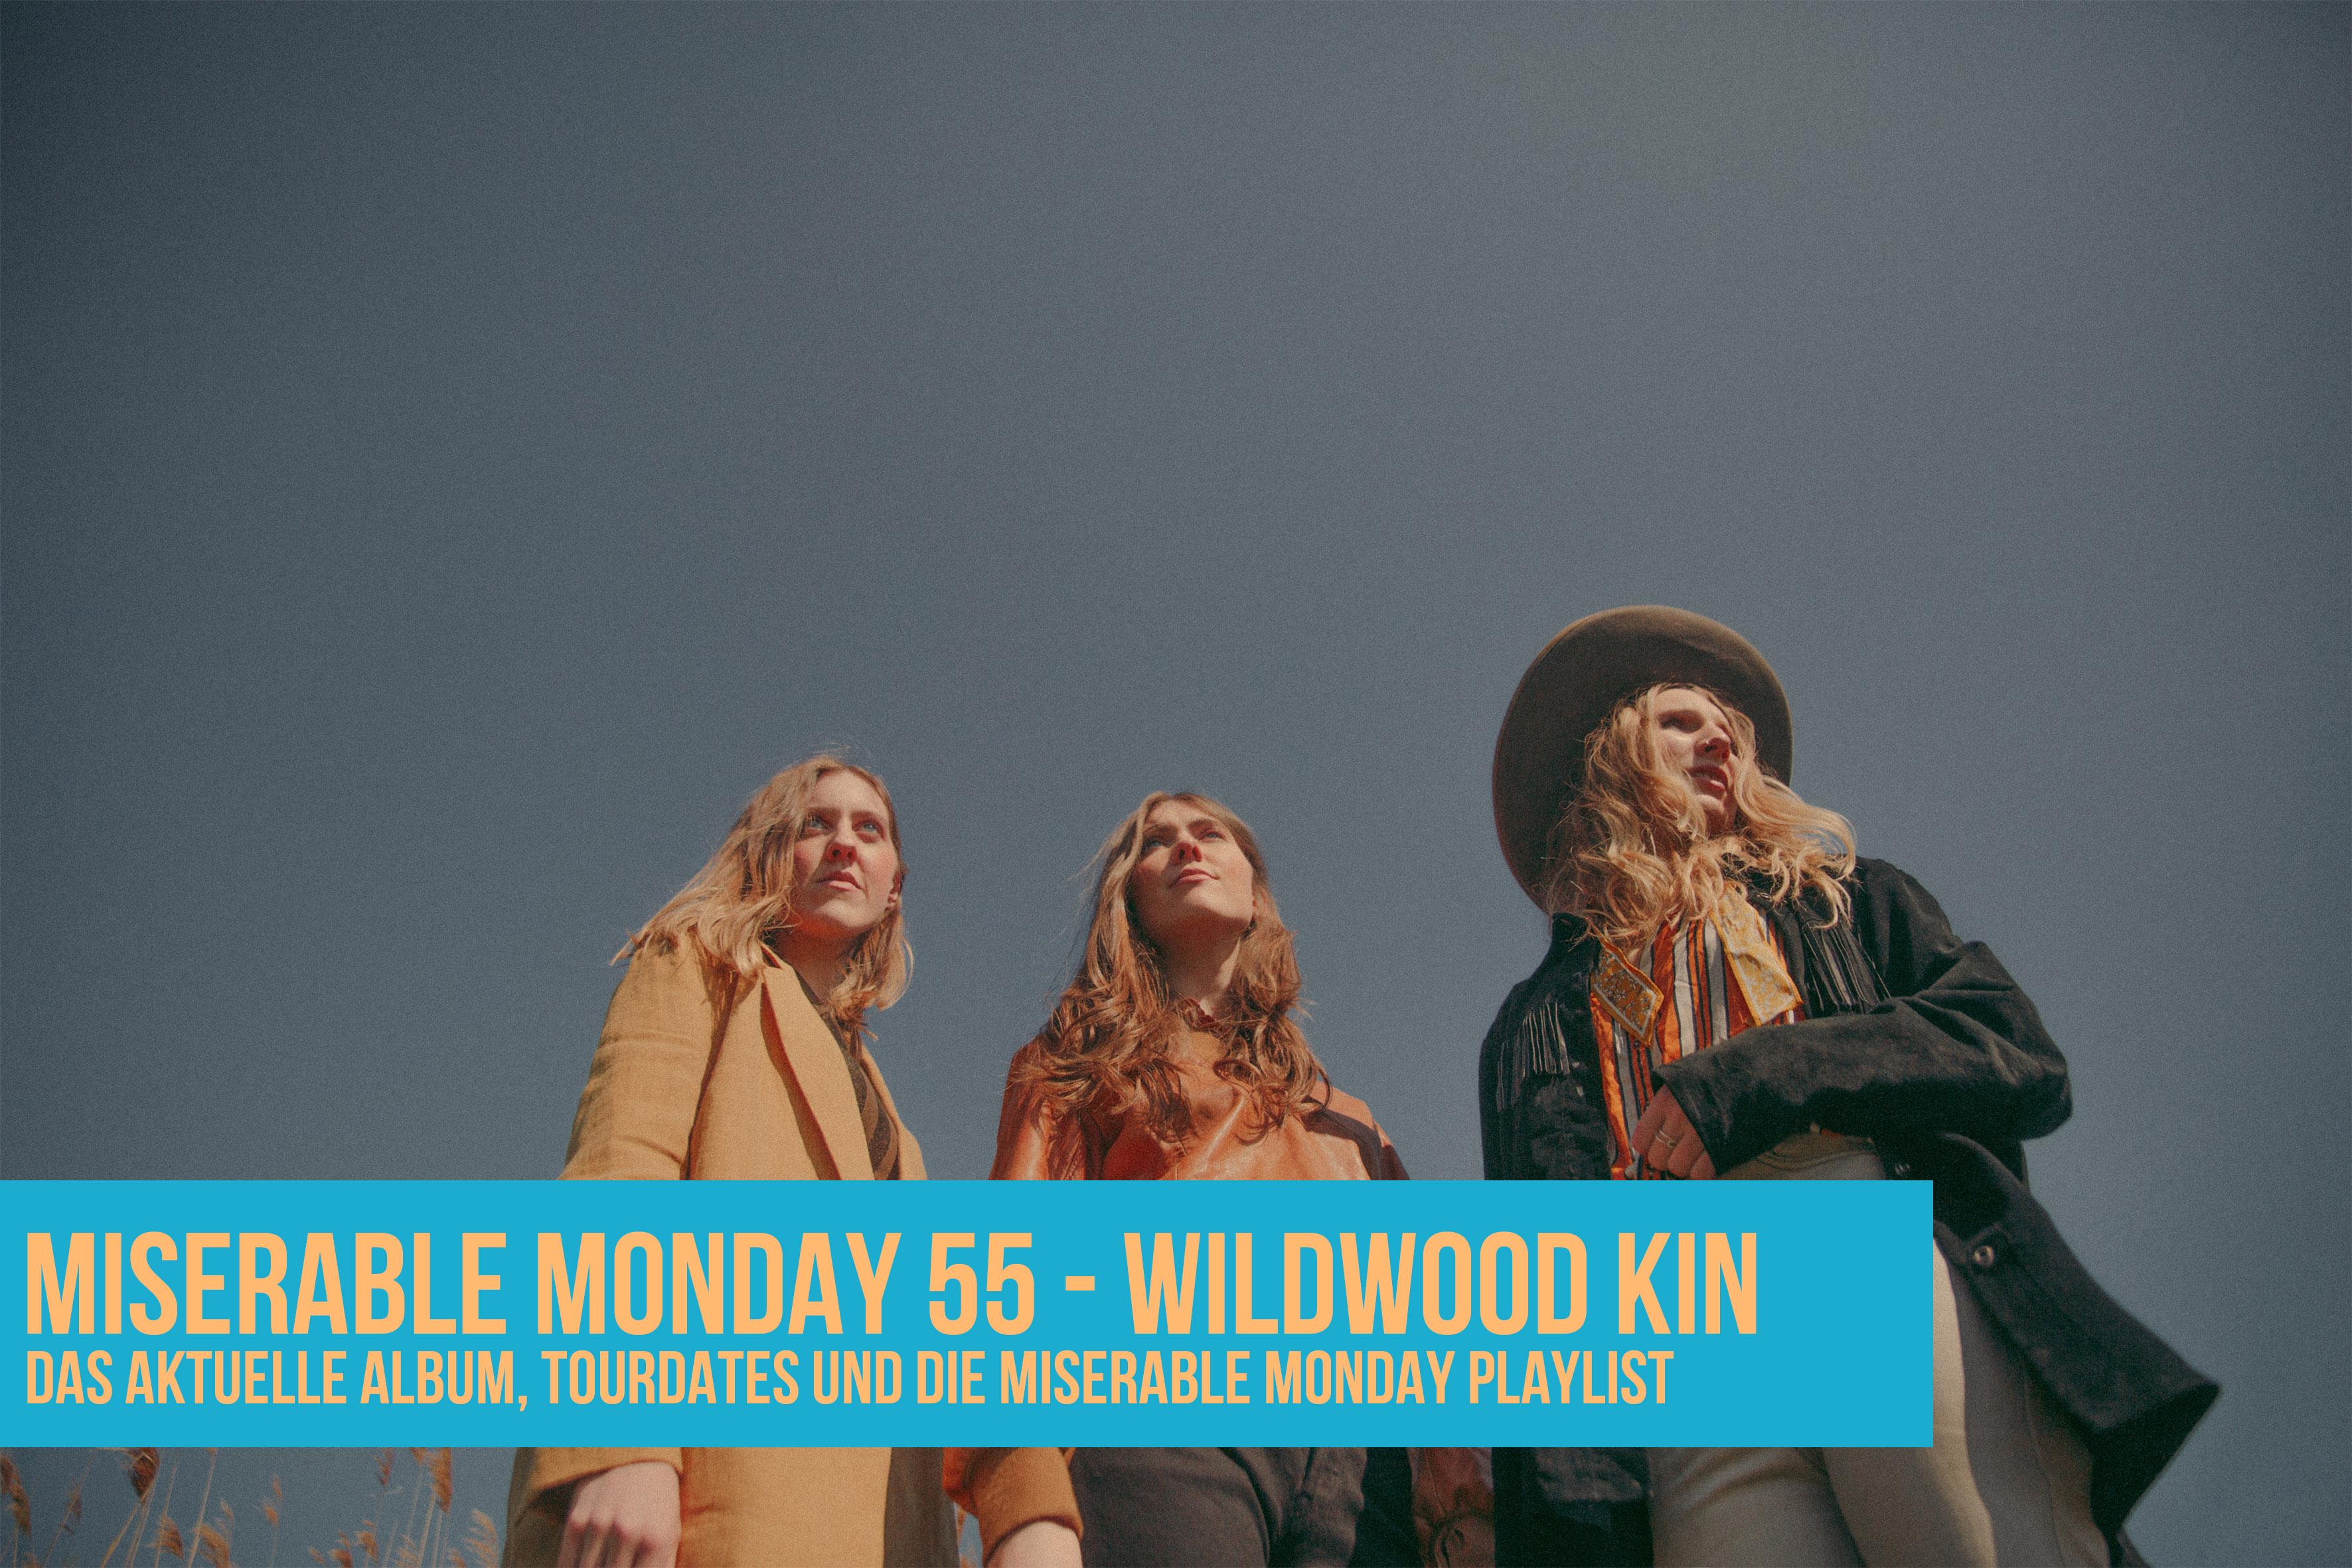 55 - Wildwood Kin